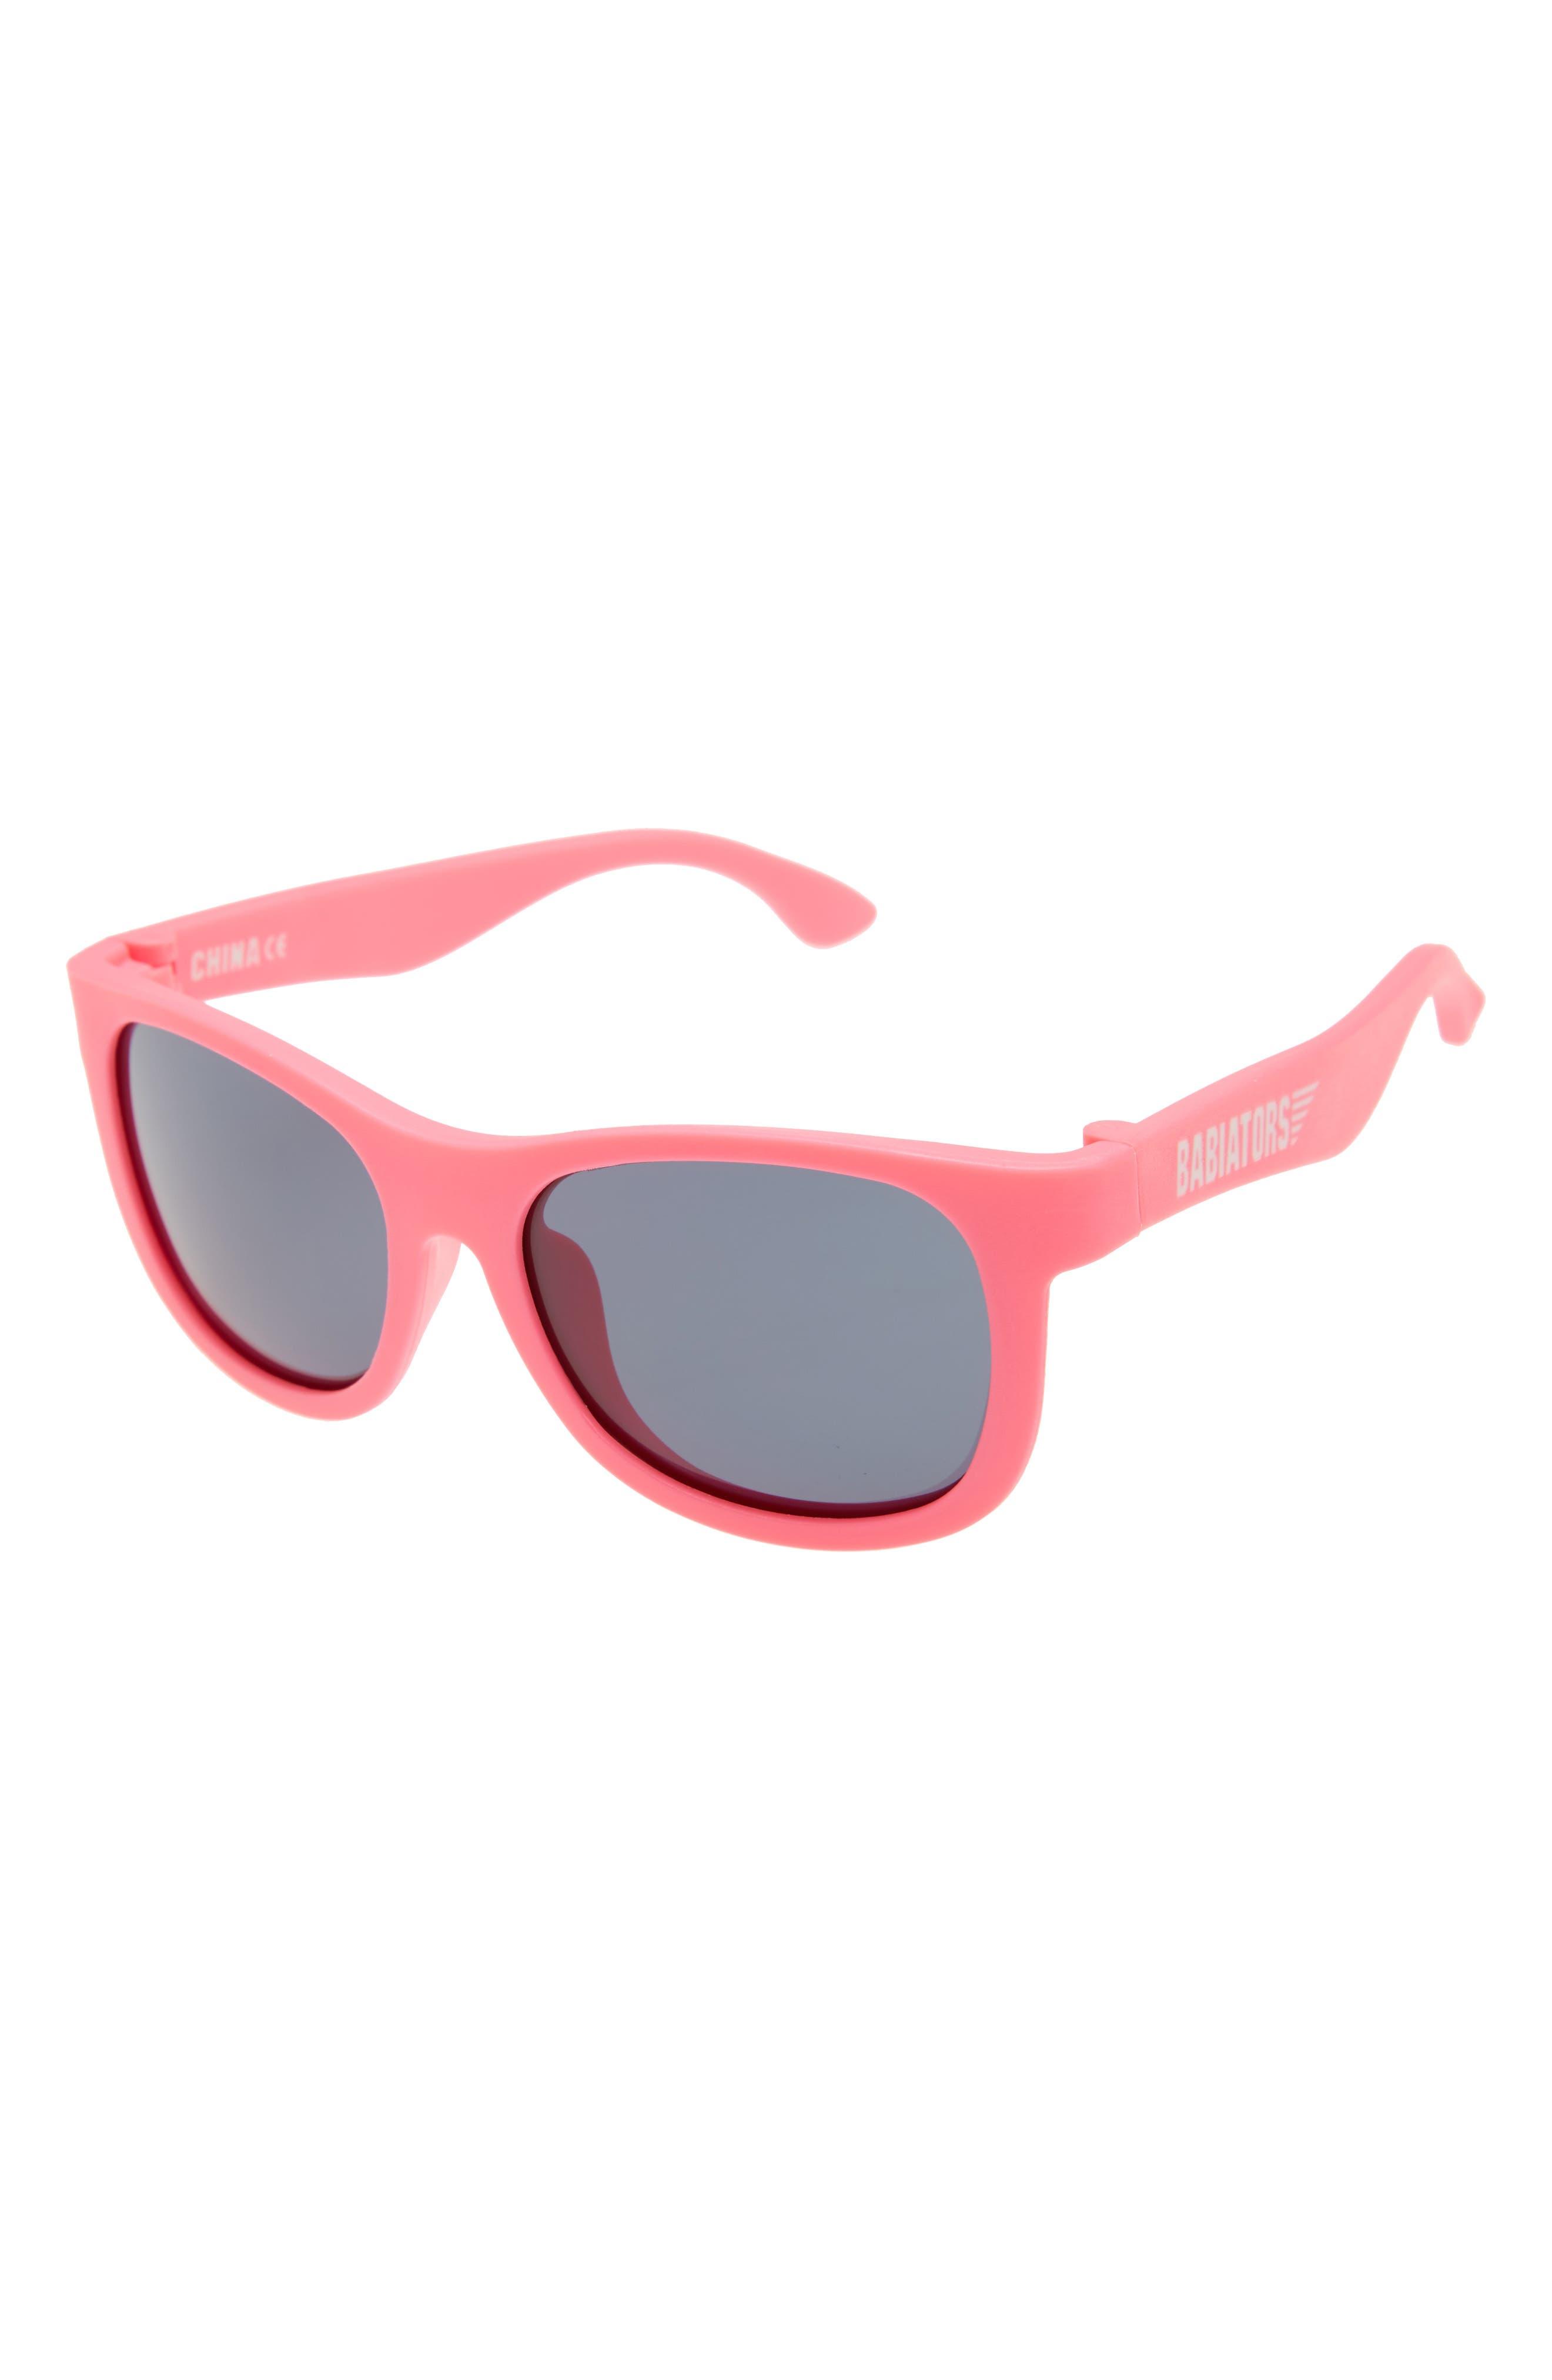 Original Navigators Sunglasses,                             Alternate thumbnail 16, color,